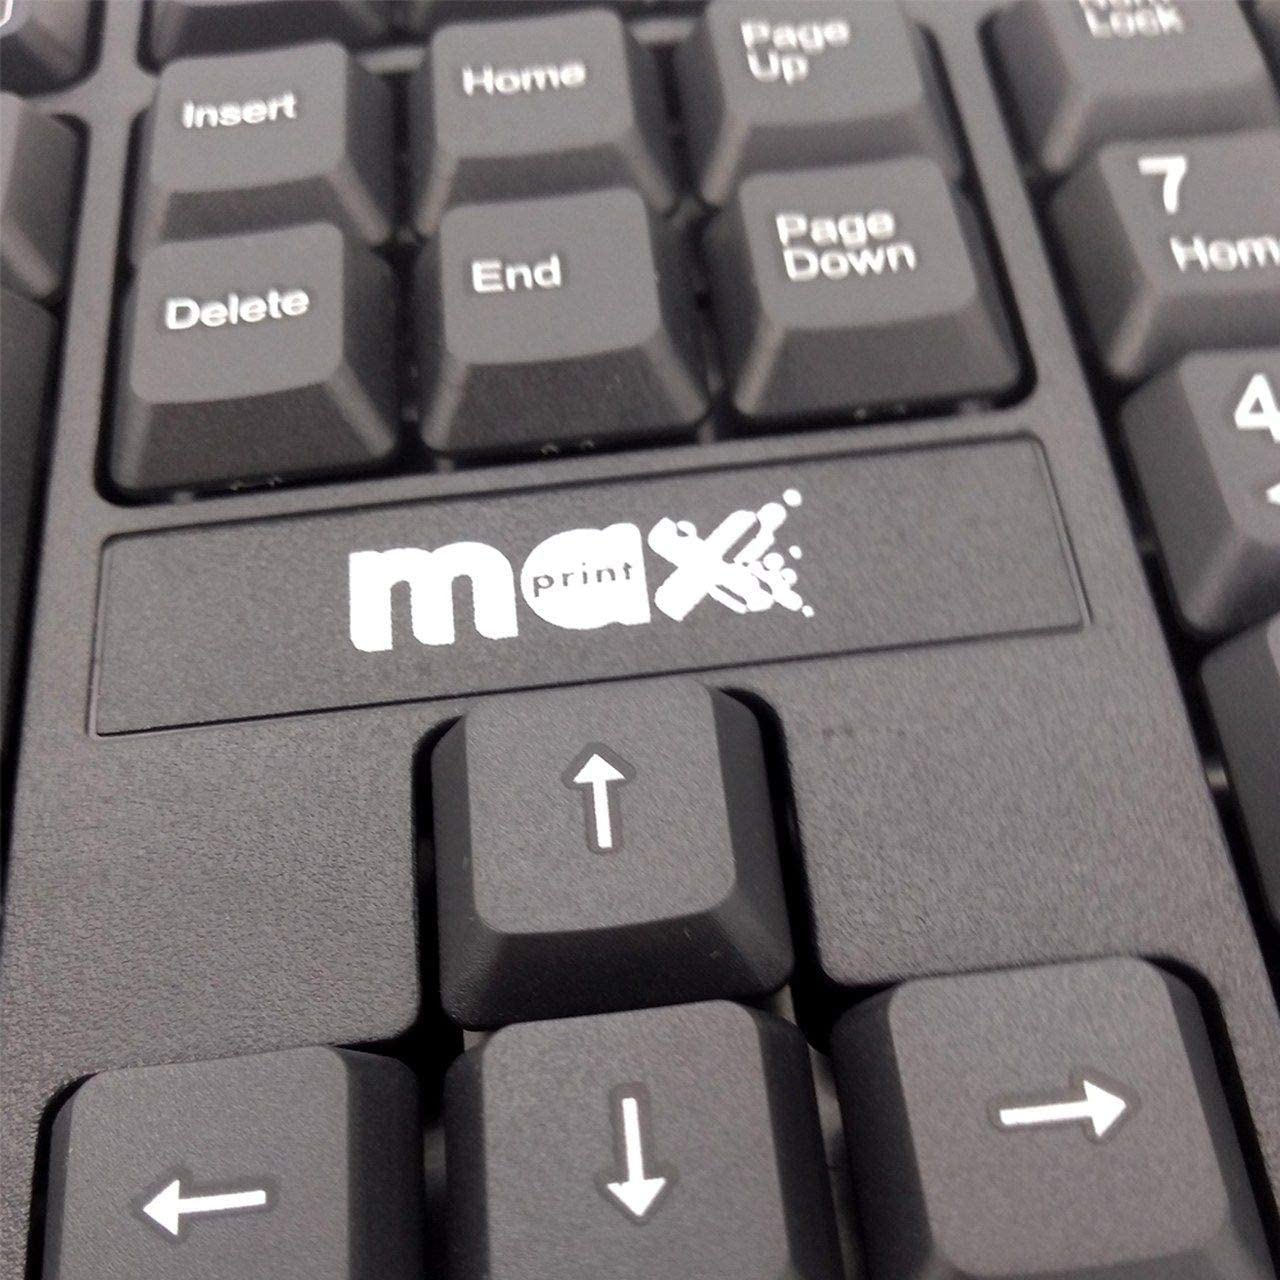 Teclado Padrão Usb Maxprint